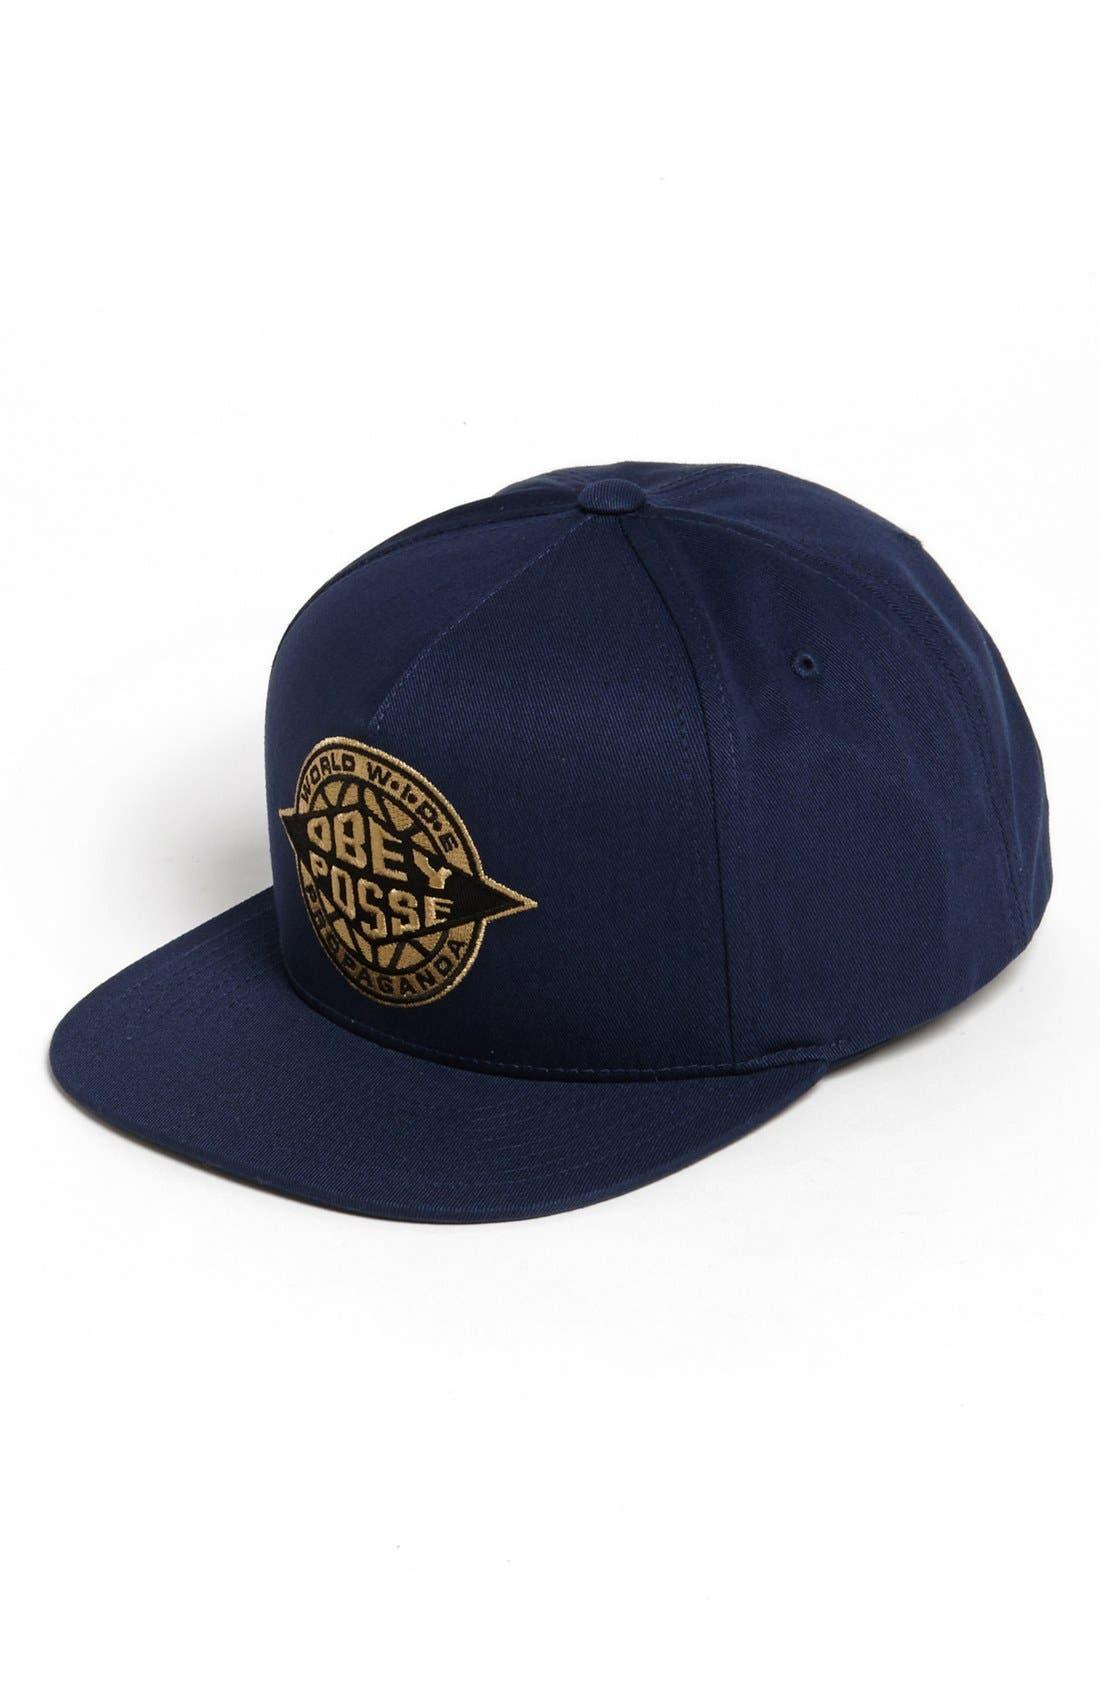 Main Image - Obey 'Ill' Snapback Baseball Cap